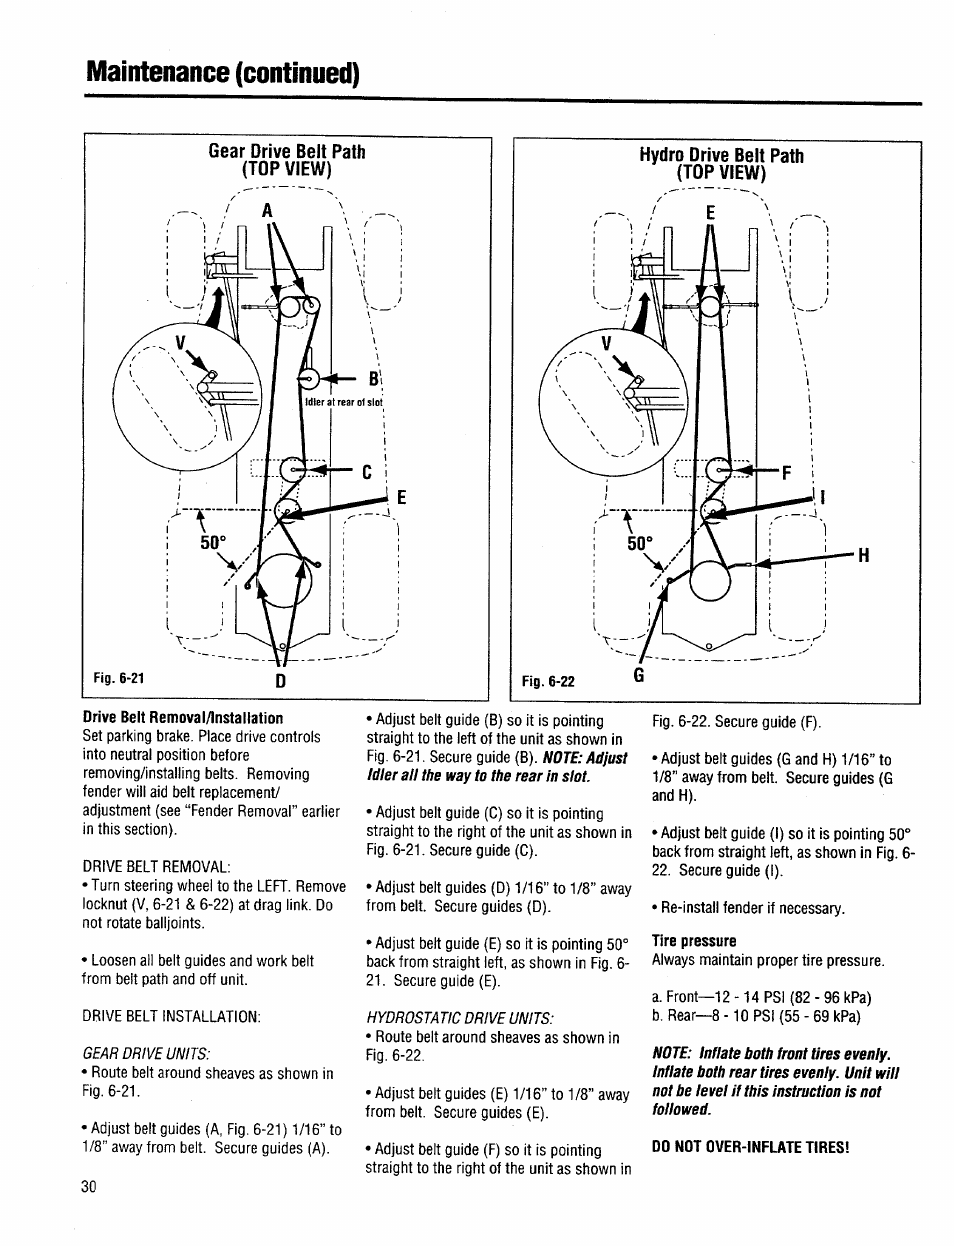 Gear drive belt path (top view), Hydro drive belt path